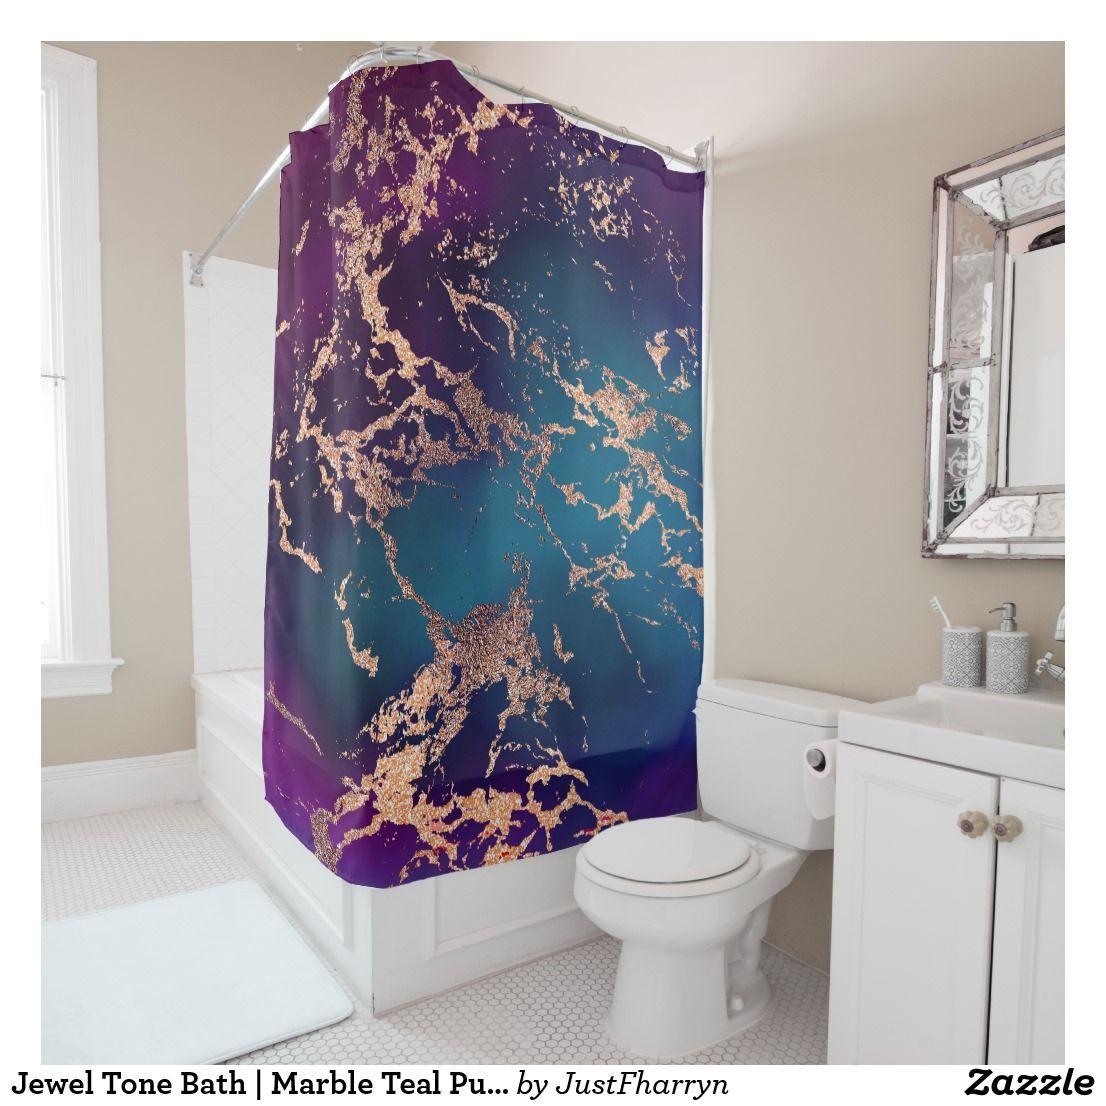 Jewel Tone Bath